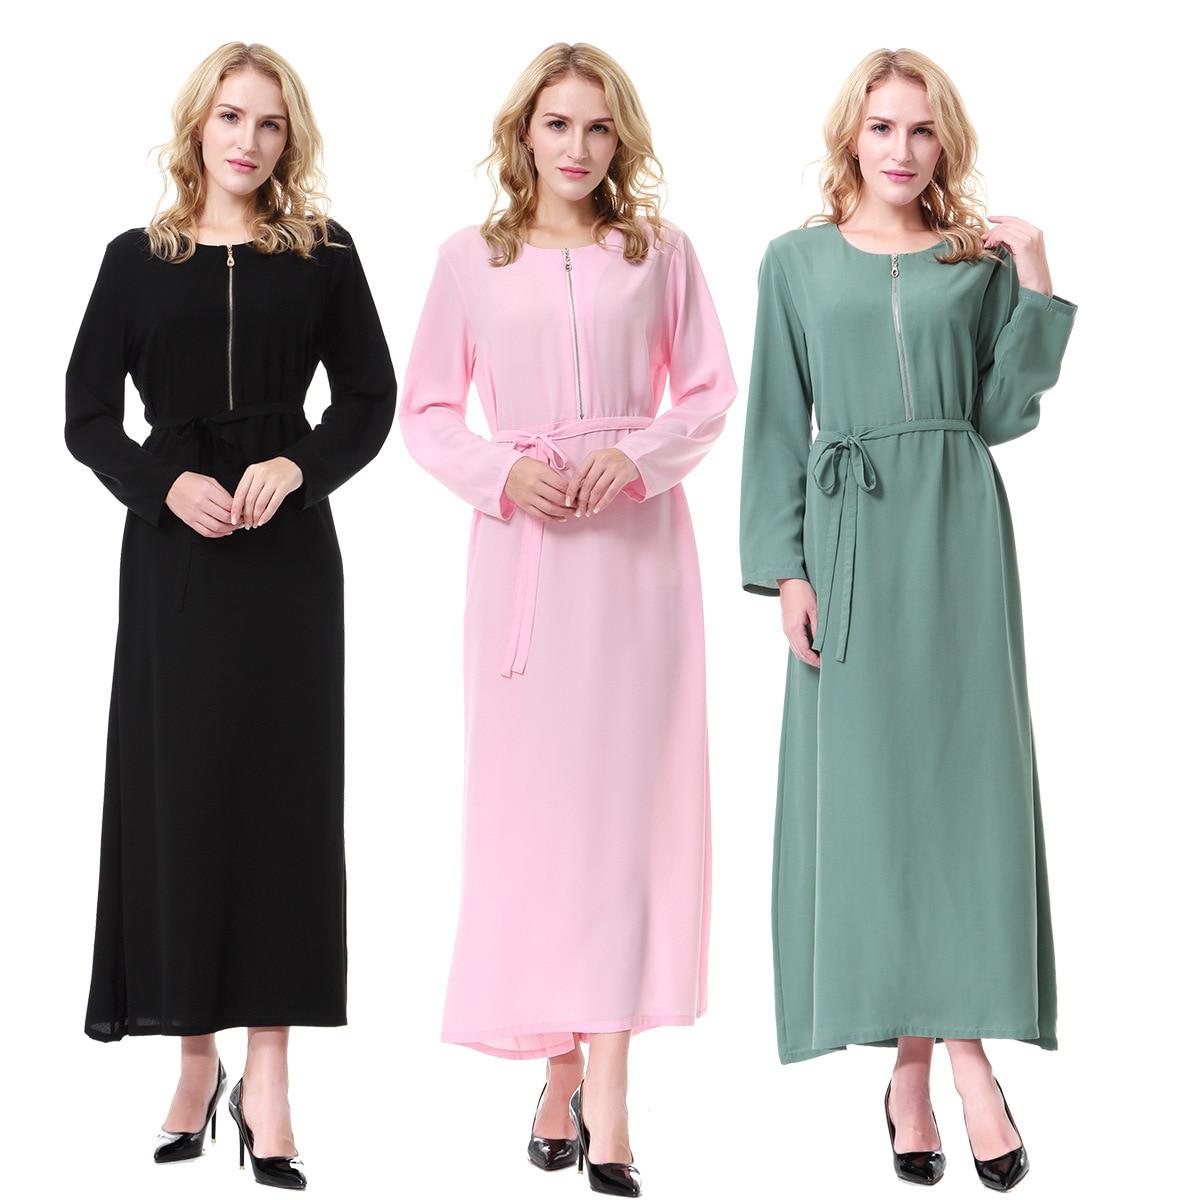 Muslim Arab Middle East Dubai Saudi Malaysia Women's Robes Long Skirts Dress, Th913